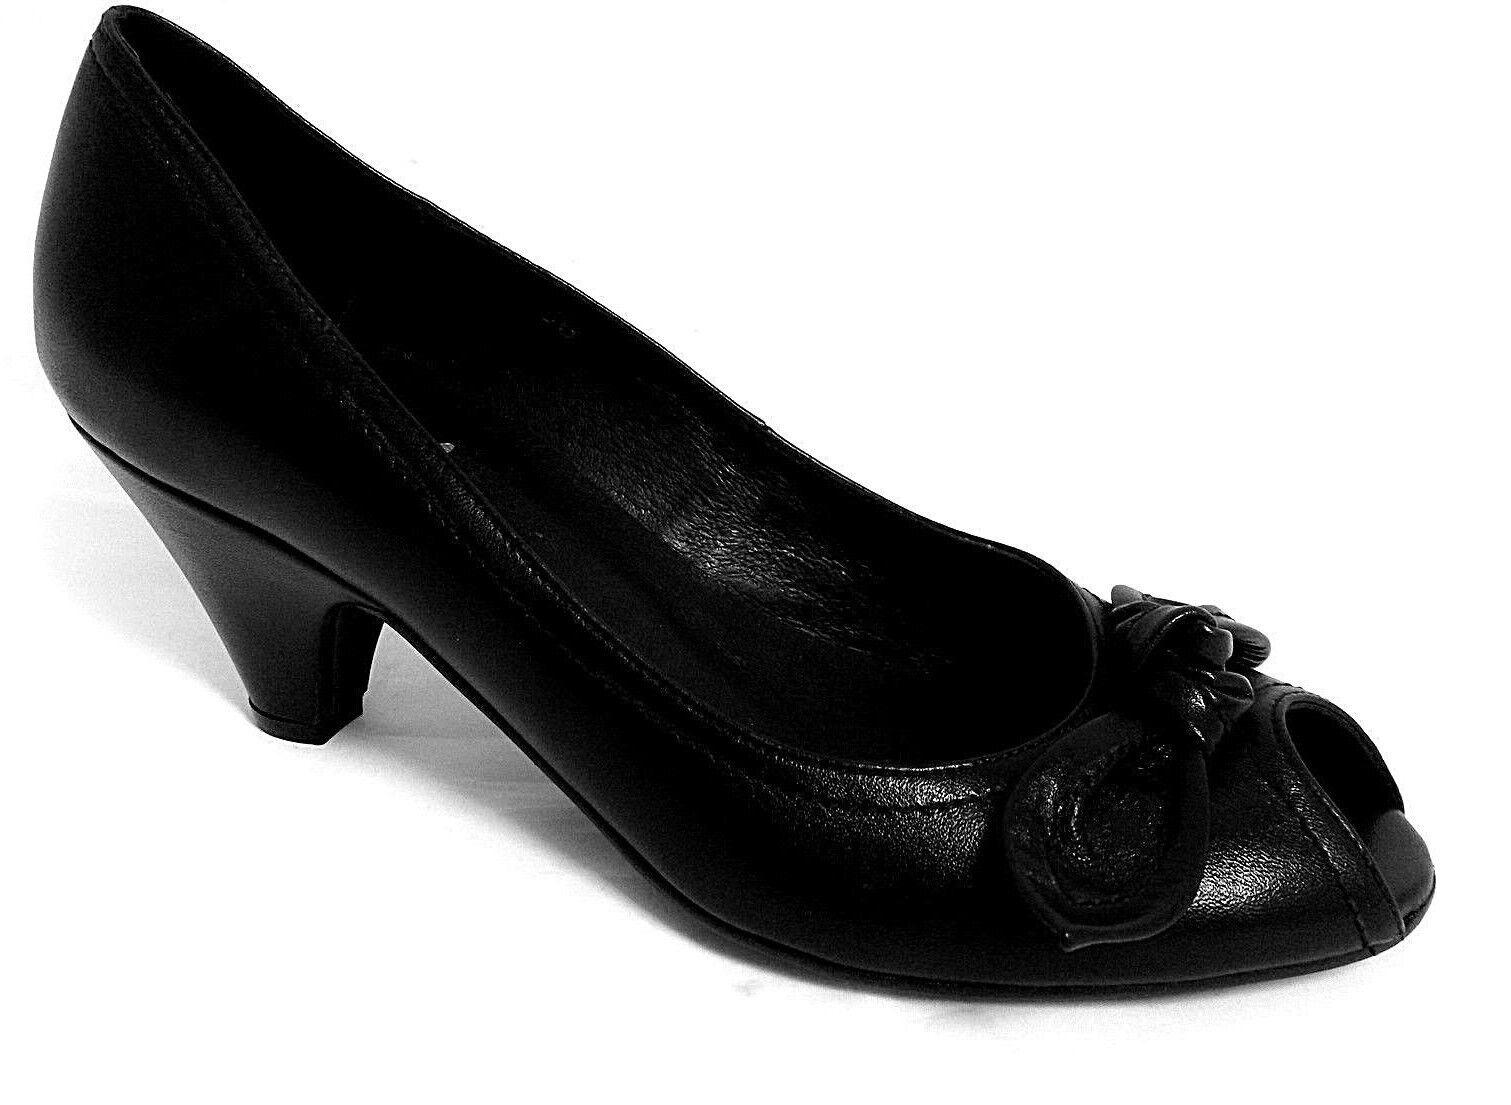 CEFALU MOLONE LADIES BLACK LEATHER HEELS PEEP-TOE COURT SHOES WOMANS UK 7-EUR 40